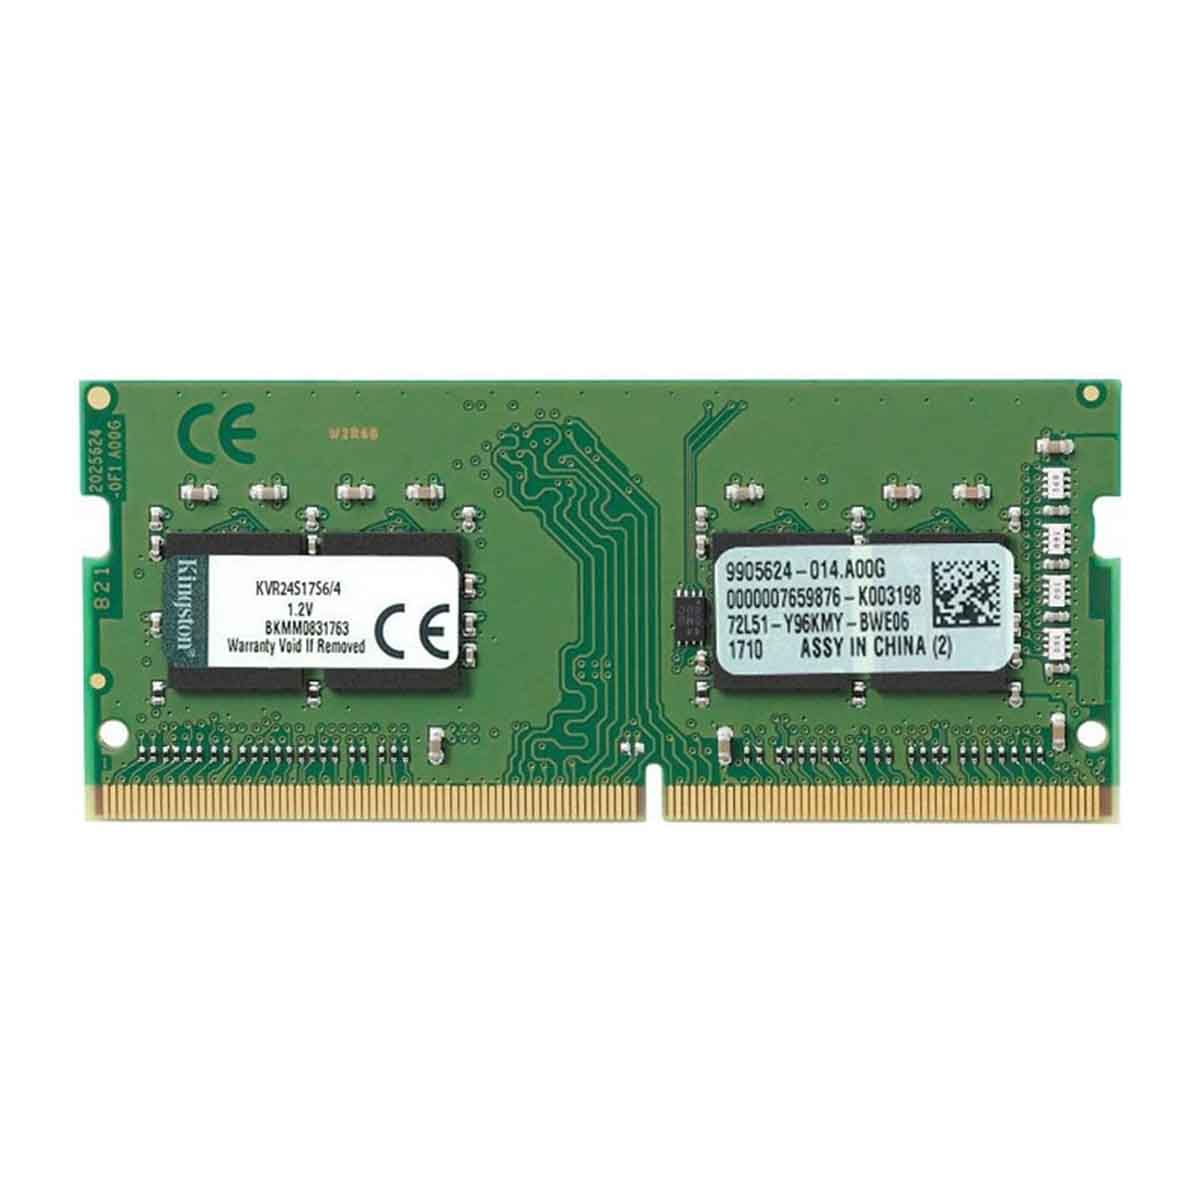 MEMORIA KINGSTON VALUE RAM 4GB 2400 -DDR4 SODIMM KVR24S17S6/4